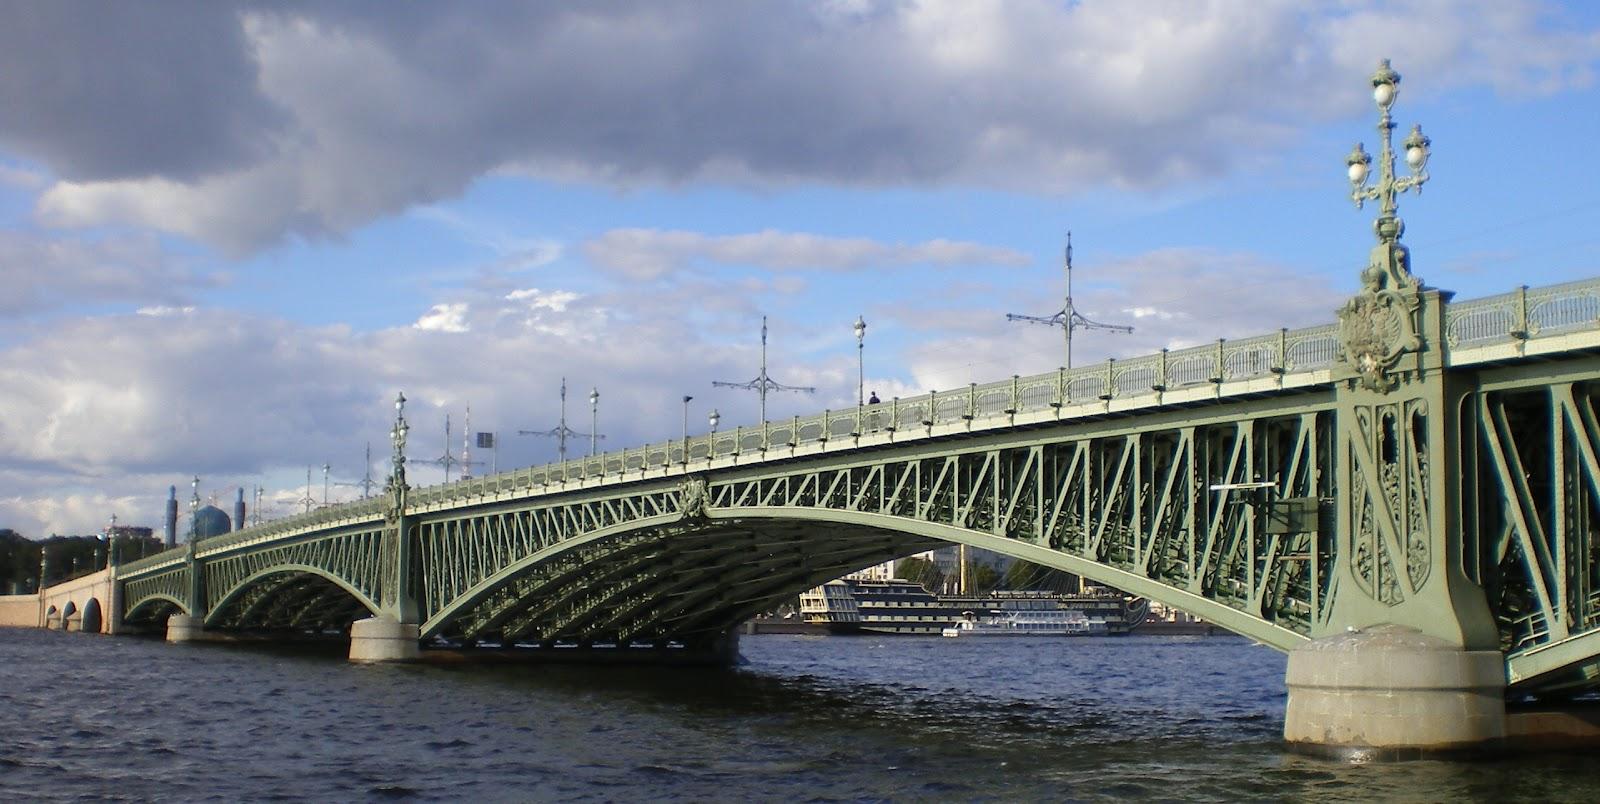 http://1.bp.blogspot.com/-XO2L15oTpds/UB0yRKQrxYI/AAAAAAAAA-U/i4zNmMuZuO0/s1600/Trinity_Bridge_-_span_of_a_bridge.JPG